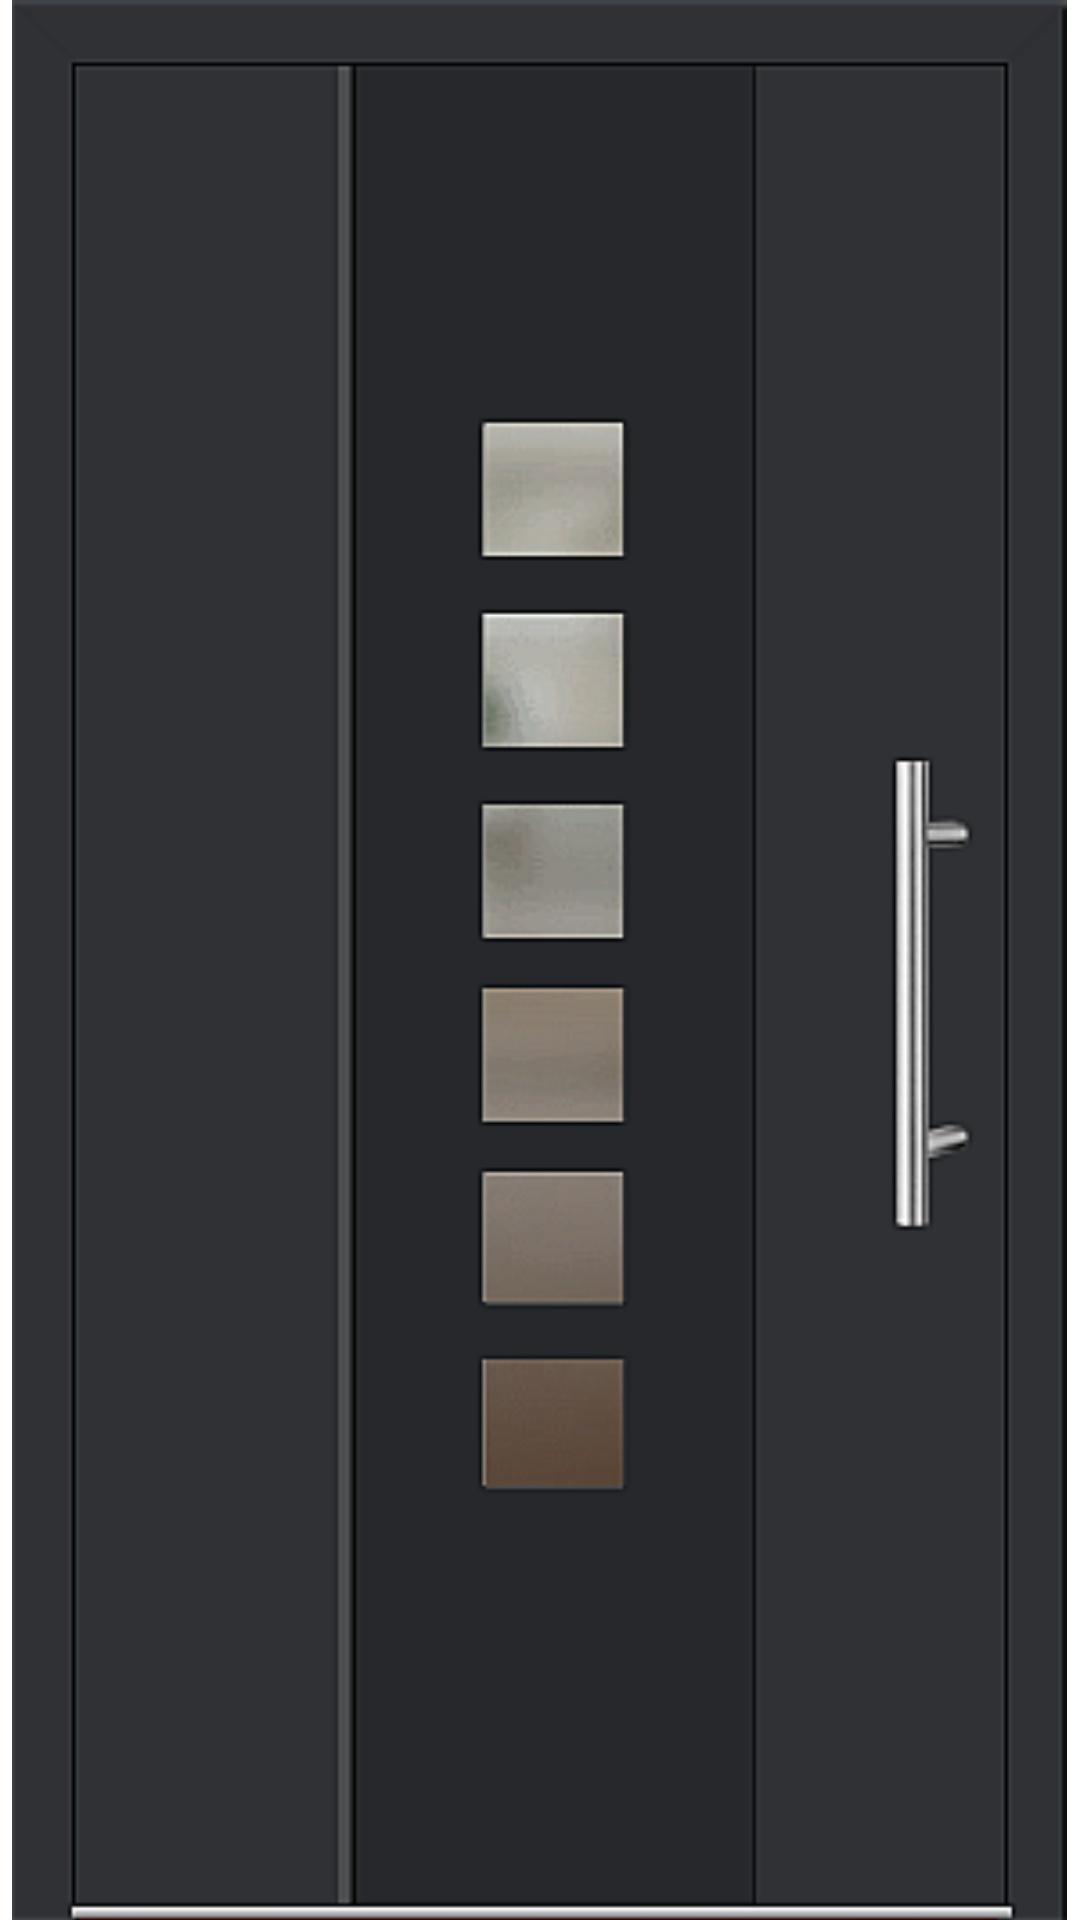 Aluminium Haustür Modell 6193-58 schwarz